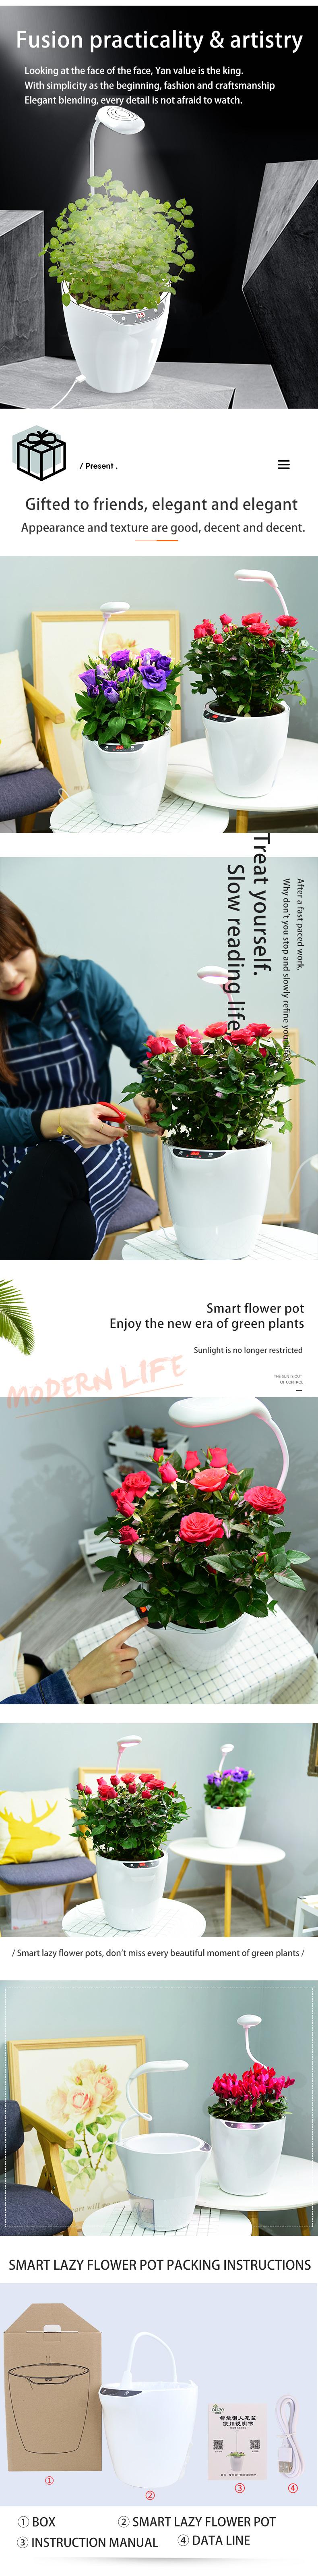 Intelligente Faul Blumentopf mit Full Spectrum Pflanzen Wachstum Lampe